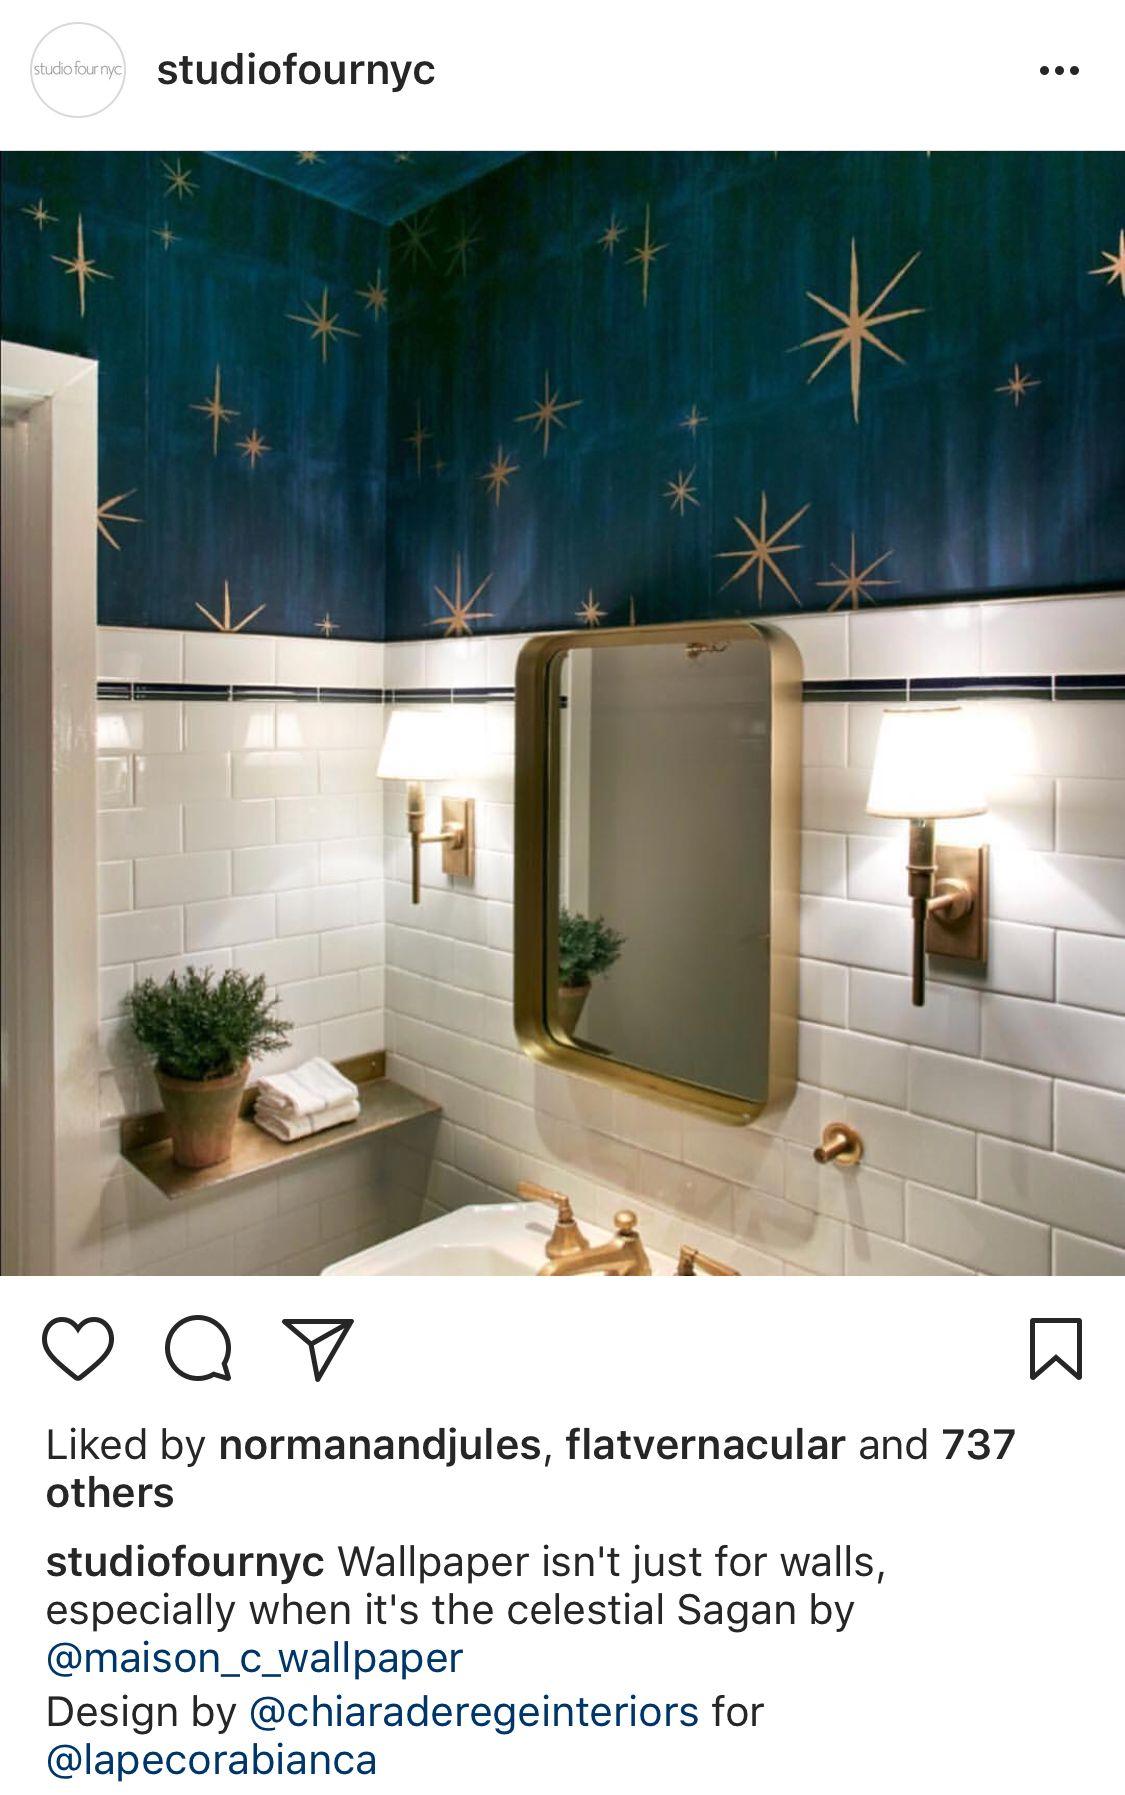 Pin By Joy Yoakum On Room Inspo Quirky Bathroom Bathroom Color Schemes Bathroom Color